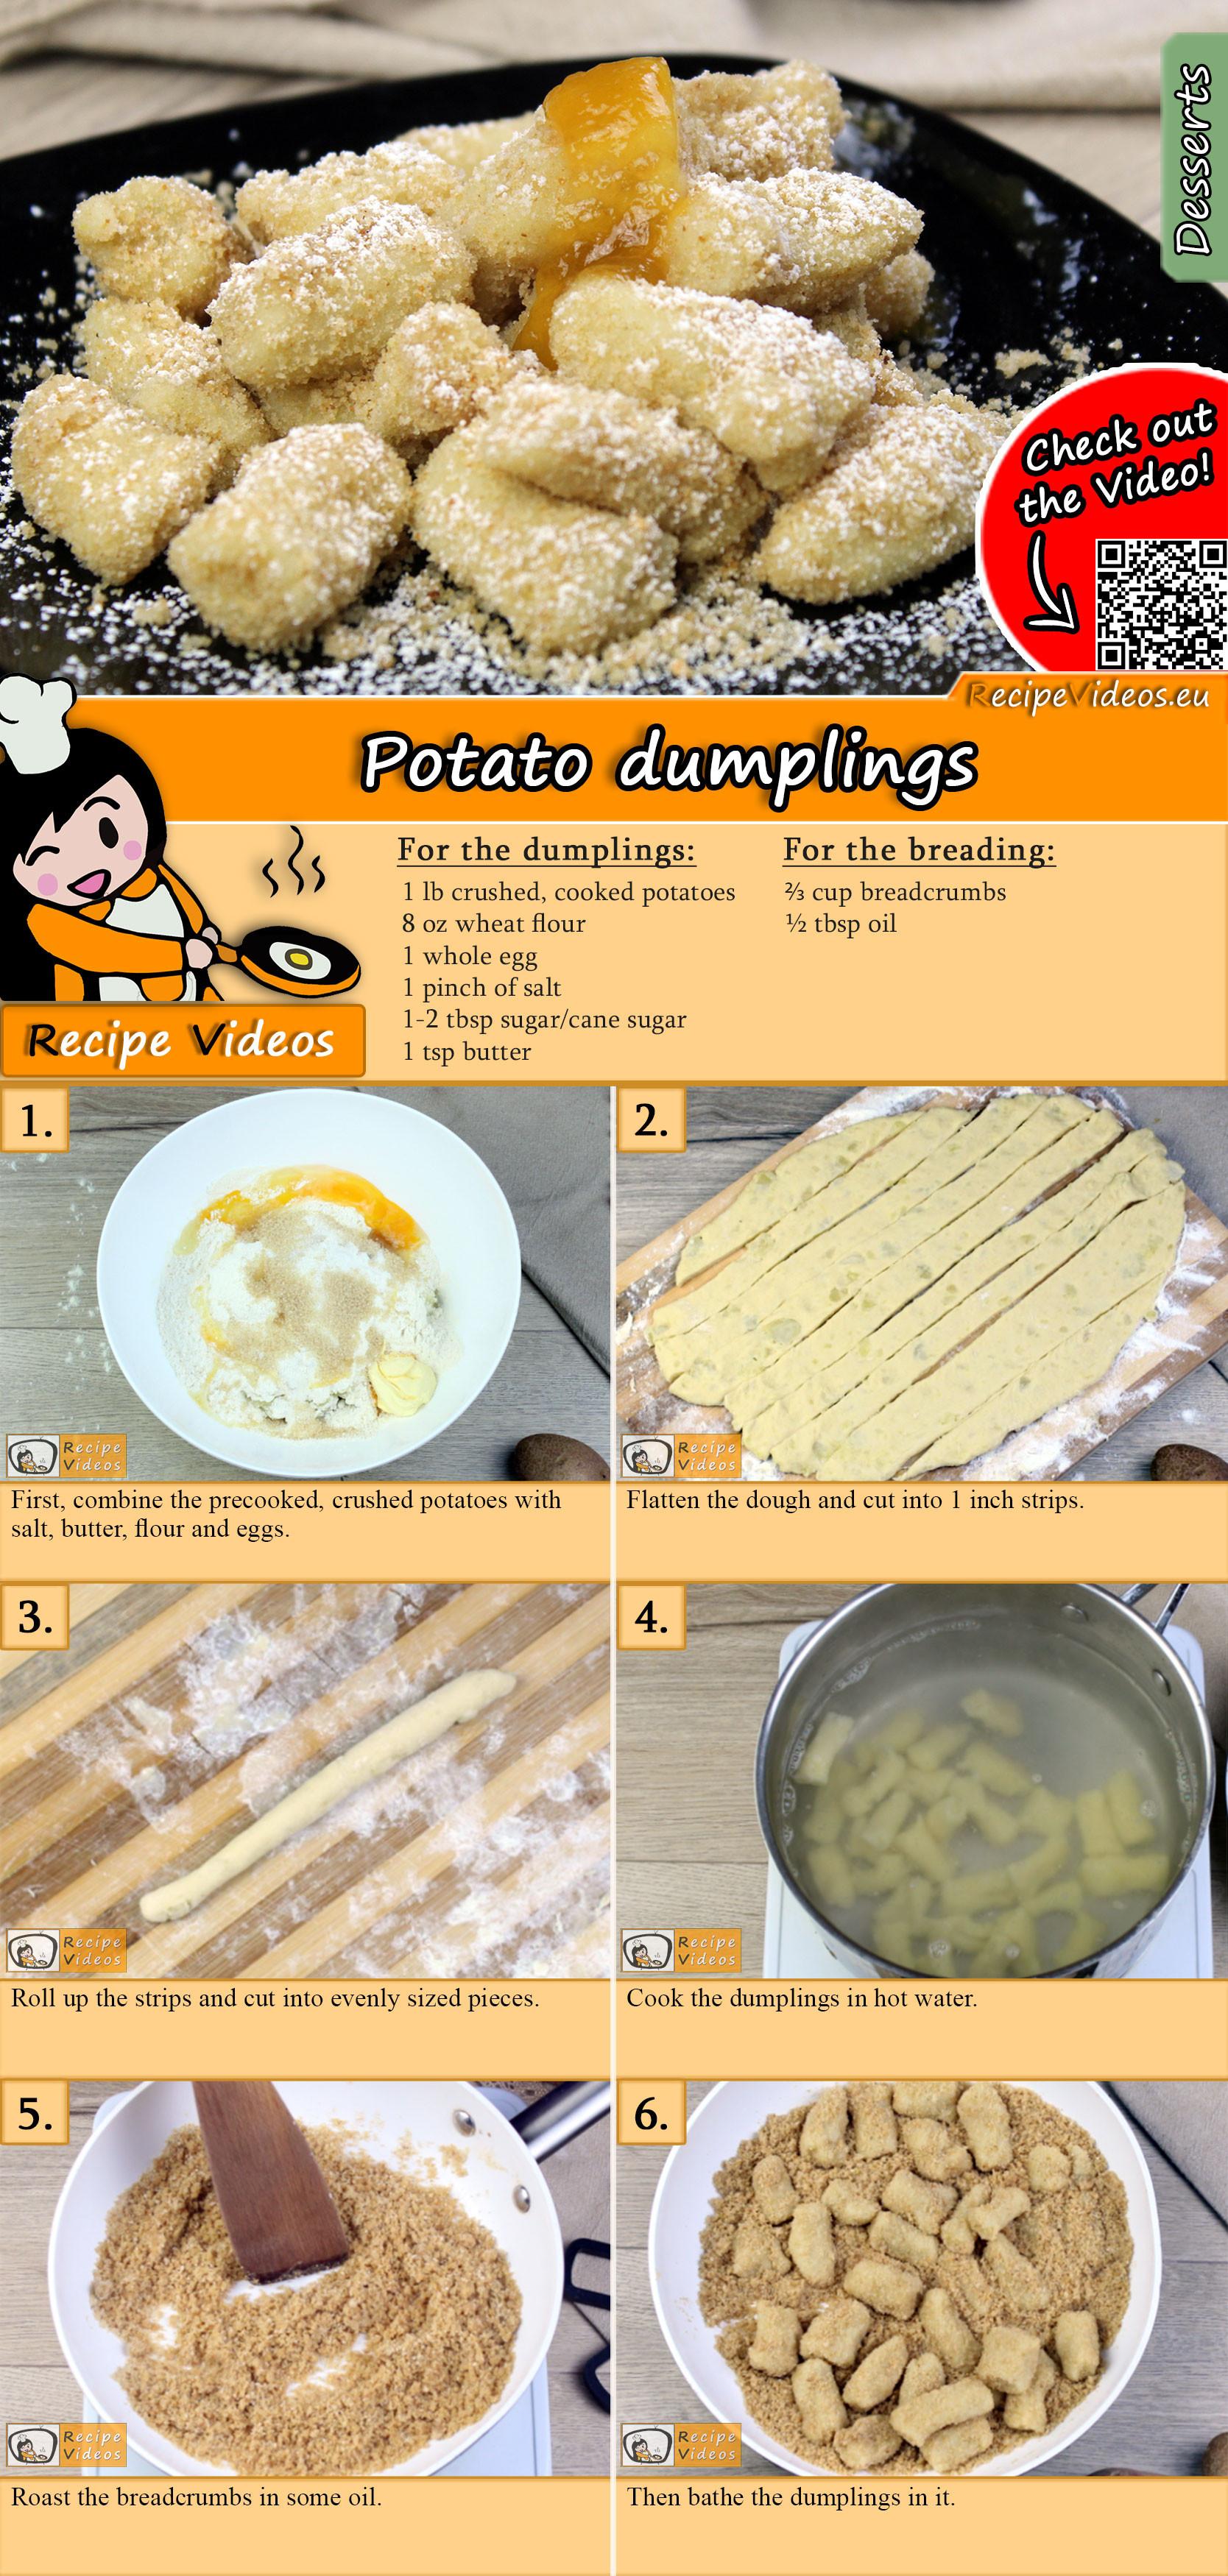 Potato dumplings recipe with video